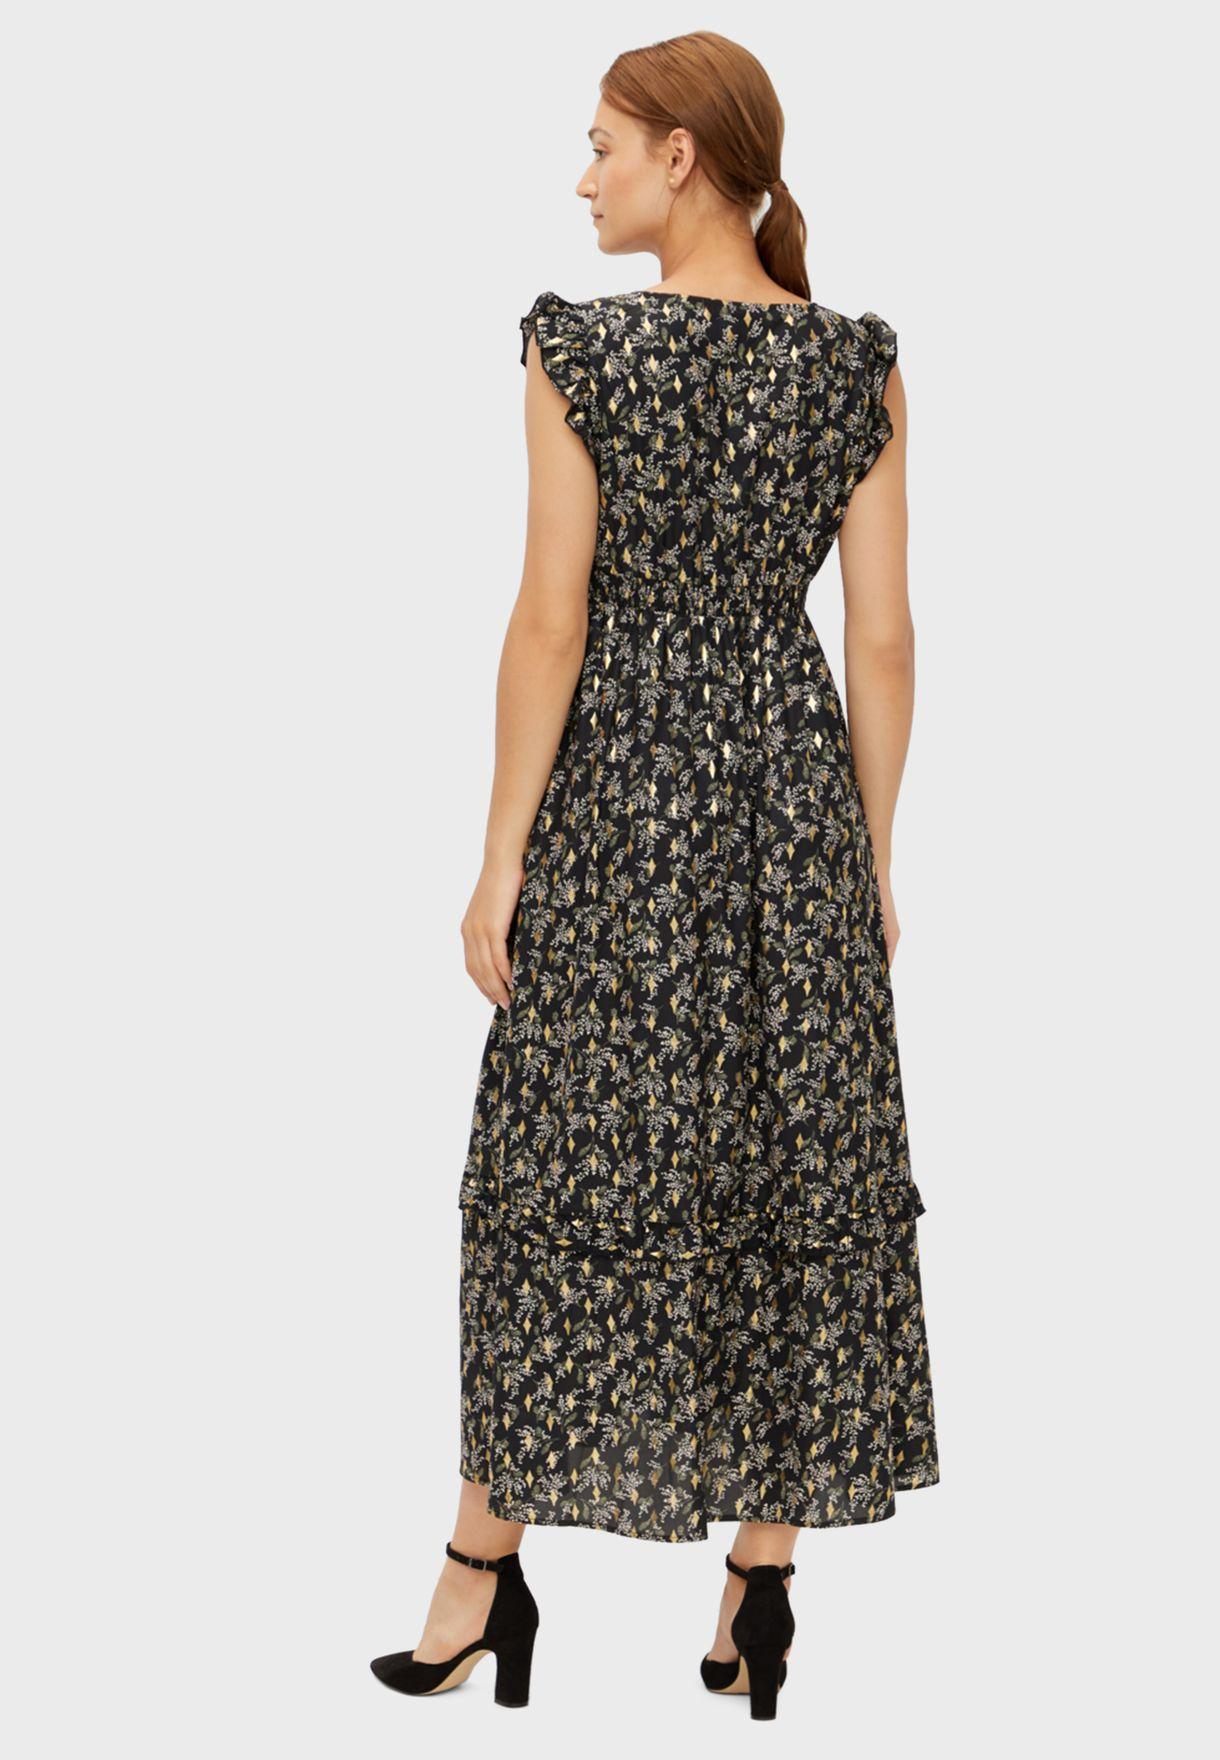 Printed Pleated Dress